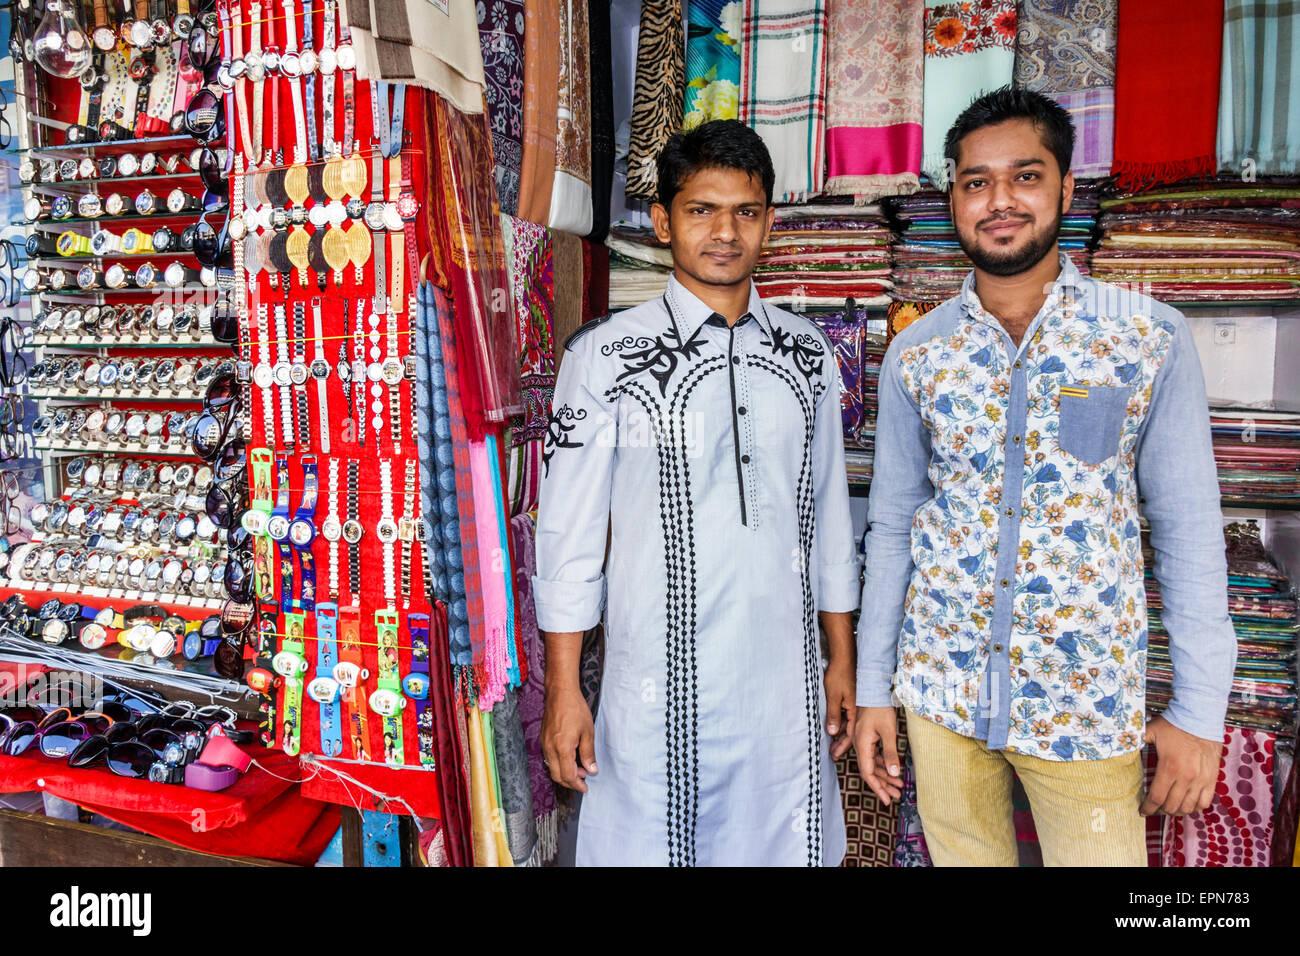 Mumbai India Asian Apollo Bandar Colaba Indumati Sakharkar Marg Causeway Market shopping man sidewalk vendor linen - Stock Image